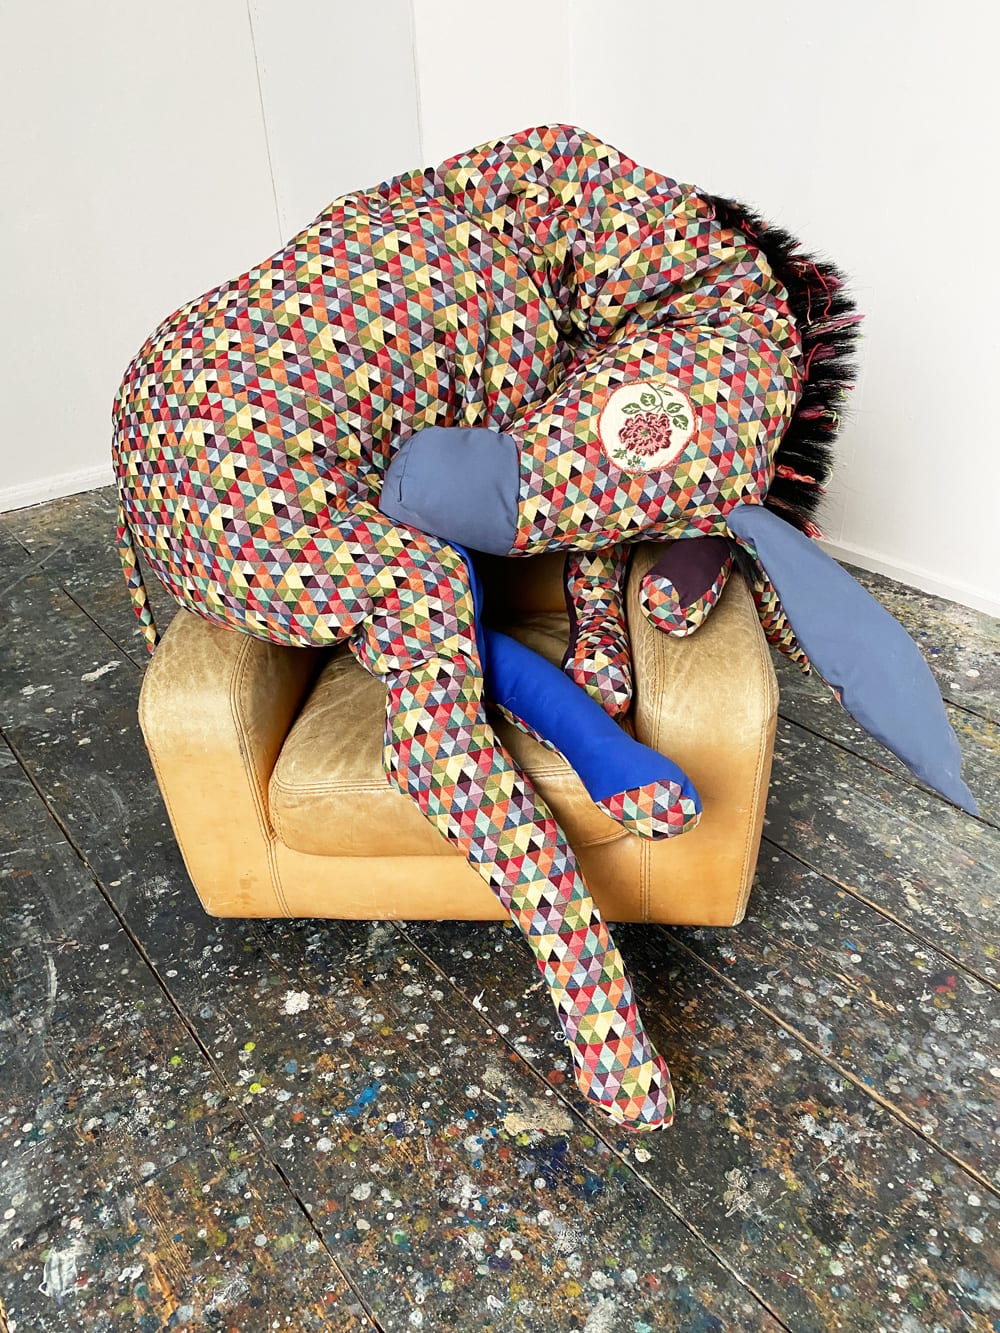 Diamond Donkey, 2020, Textile, Cotton, Wool, Horsehair, Zipper, ca. 250 x 150 x 50 cm, courtesy of Hilgemann Art & the artist / Foto: obs / haebmau.ATELIER / Stephen Wilks